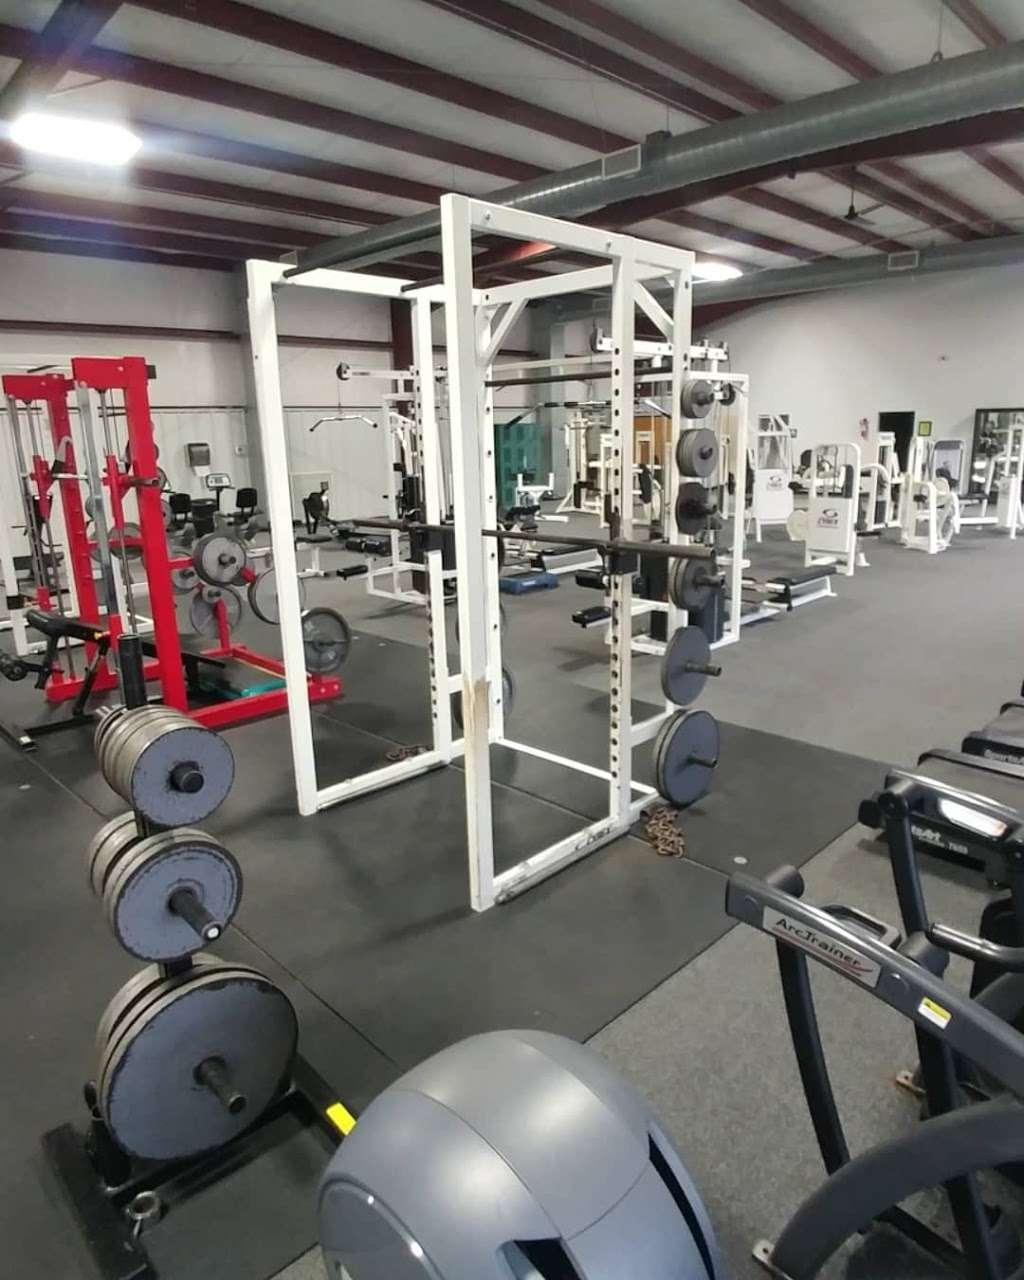 Ultimate Image Fitness Center - health  | Photo 1 of 7 | Address: 300 Spring Cir, Odessa, MO 64076, USA | Phone: (816) 633-8348